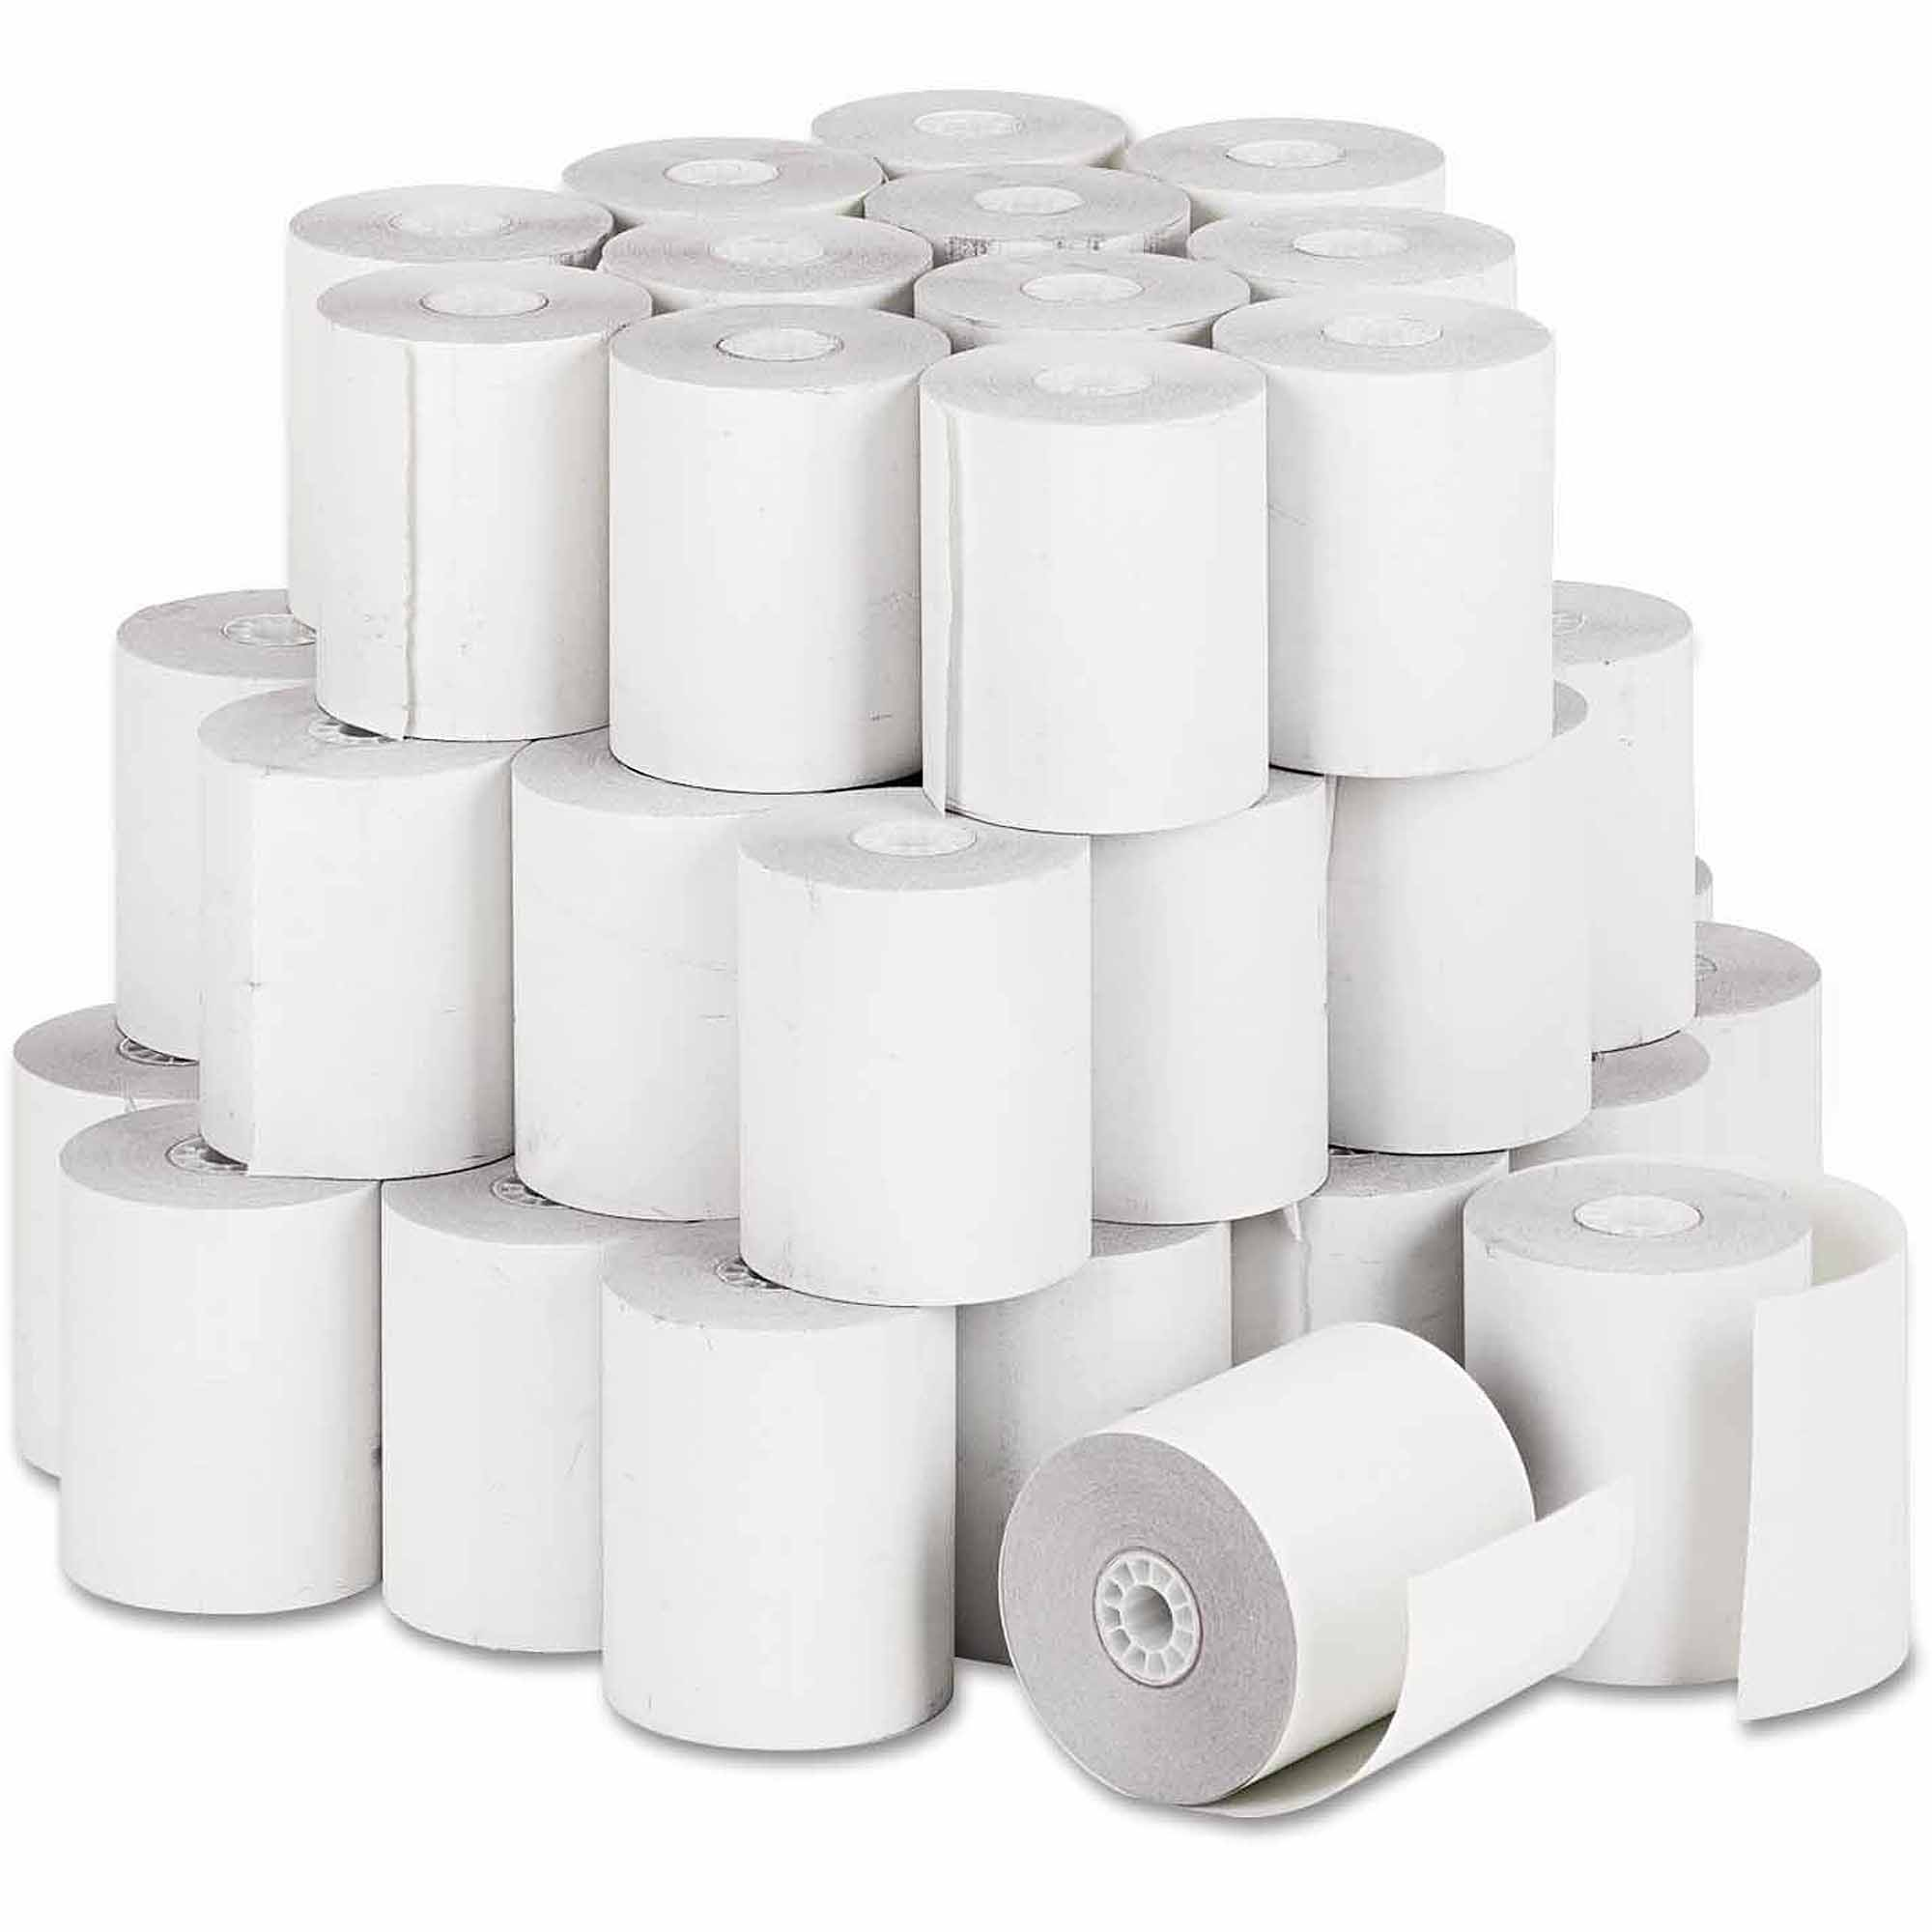 "Paper Rolls, Teller Window/Financial Roll, 3"" x 140 ft, White, 50/Carton"